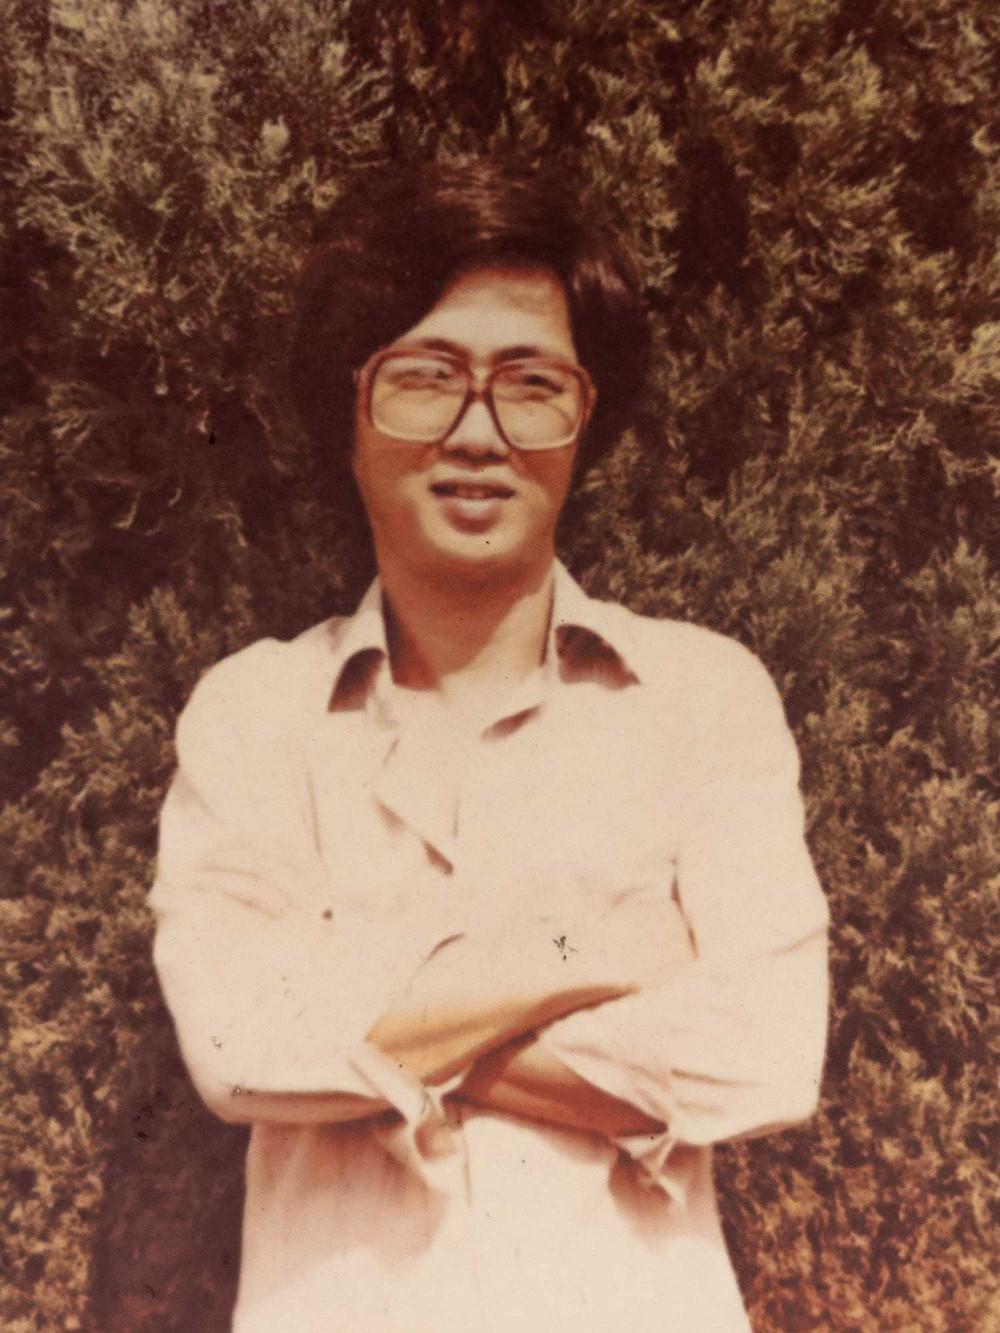 Mr Tan Tan Tiong  Hoe  when he was 19